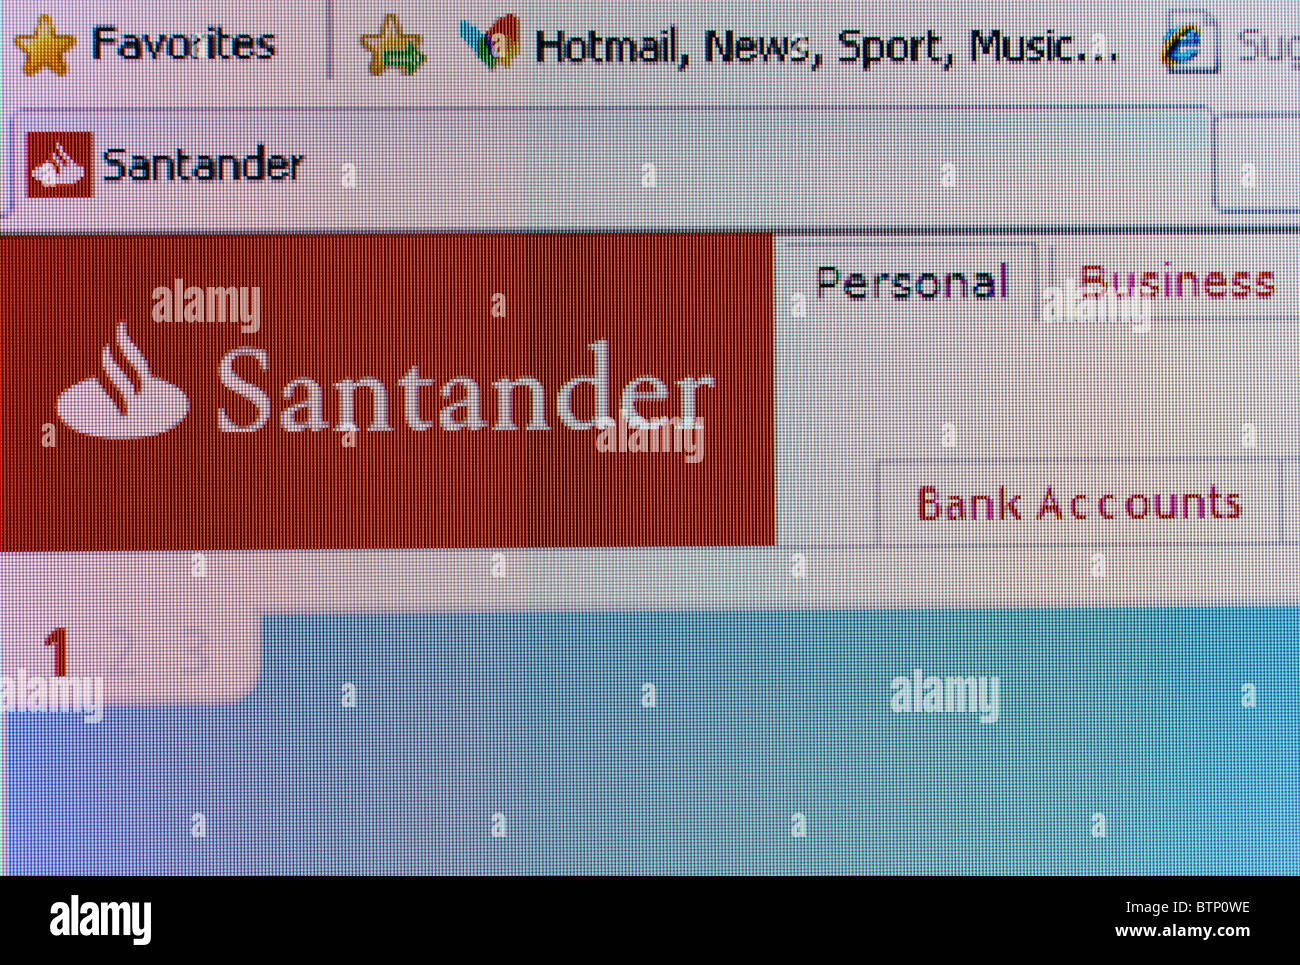 a screen shot of the Santander internet banking website - Stock Image